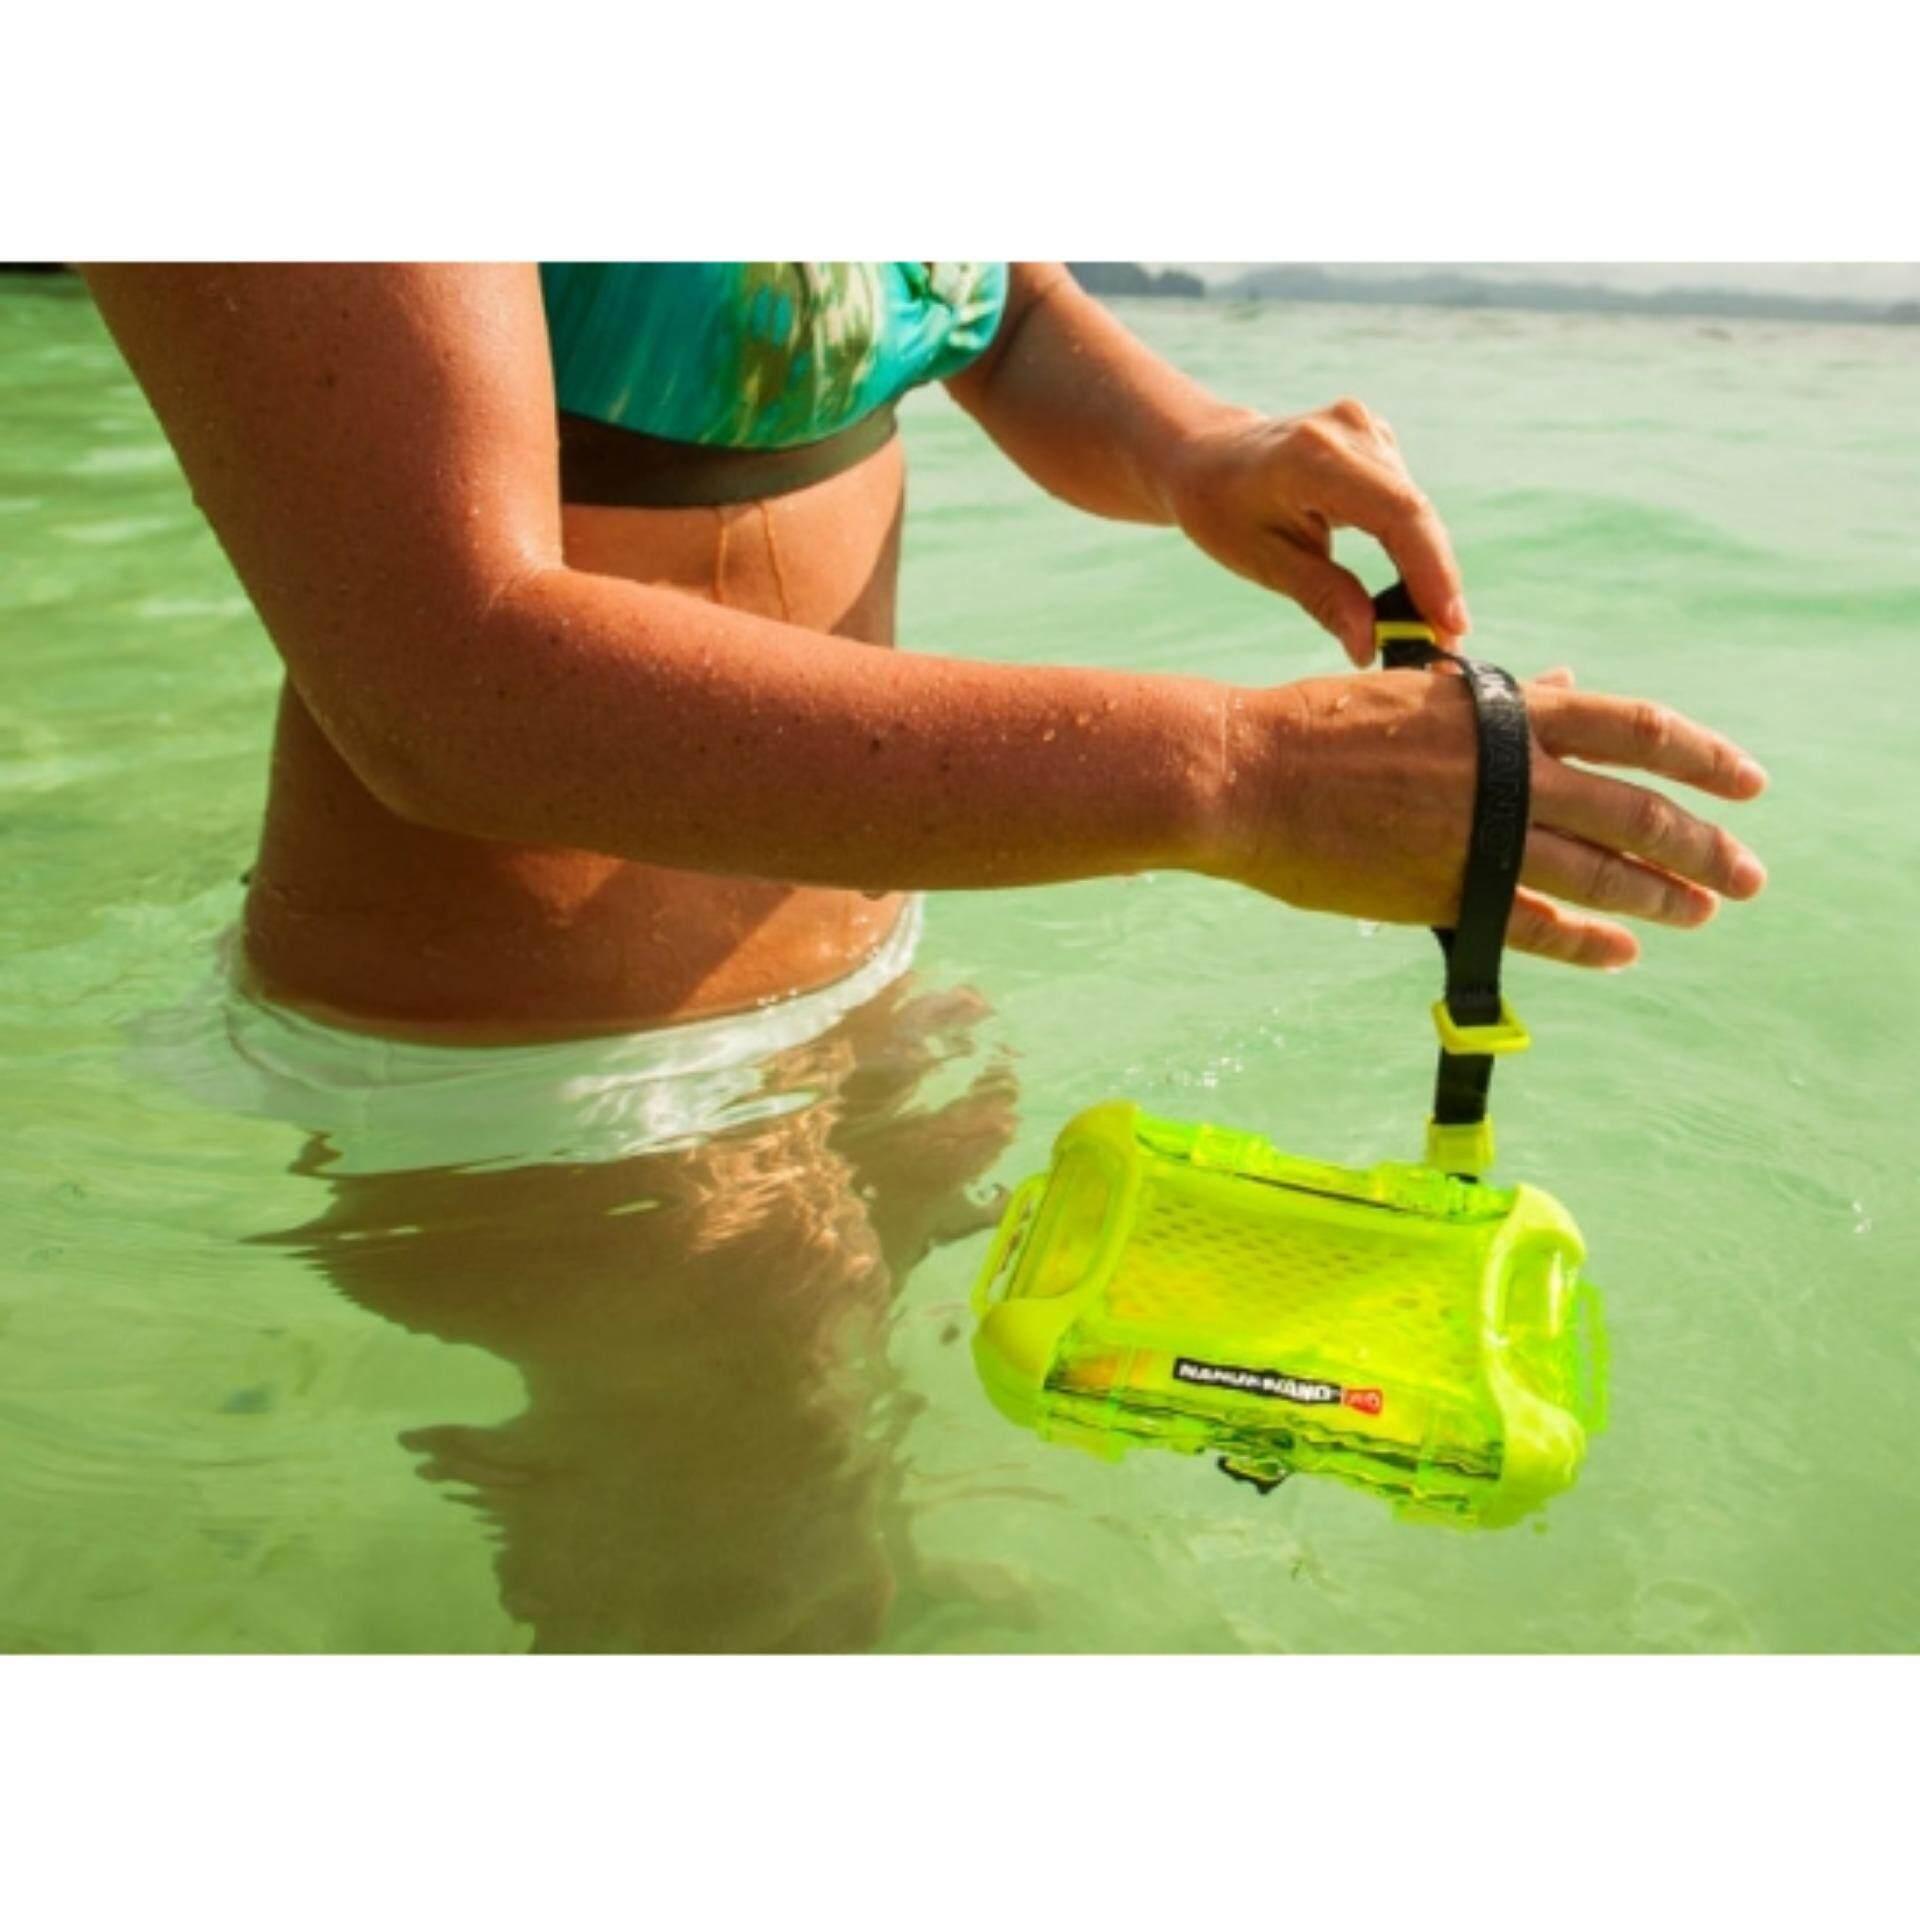 Nanuk 320 Nano Series Waterproof Small Hard Case for Phones, Cameras and Electronics